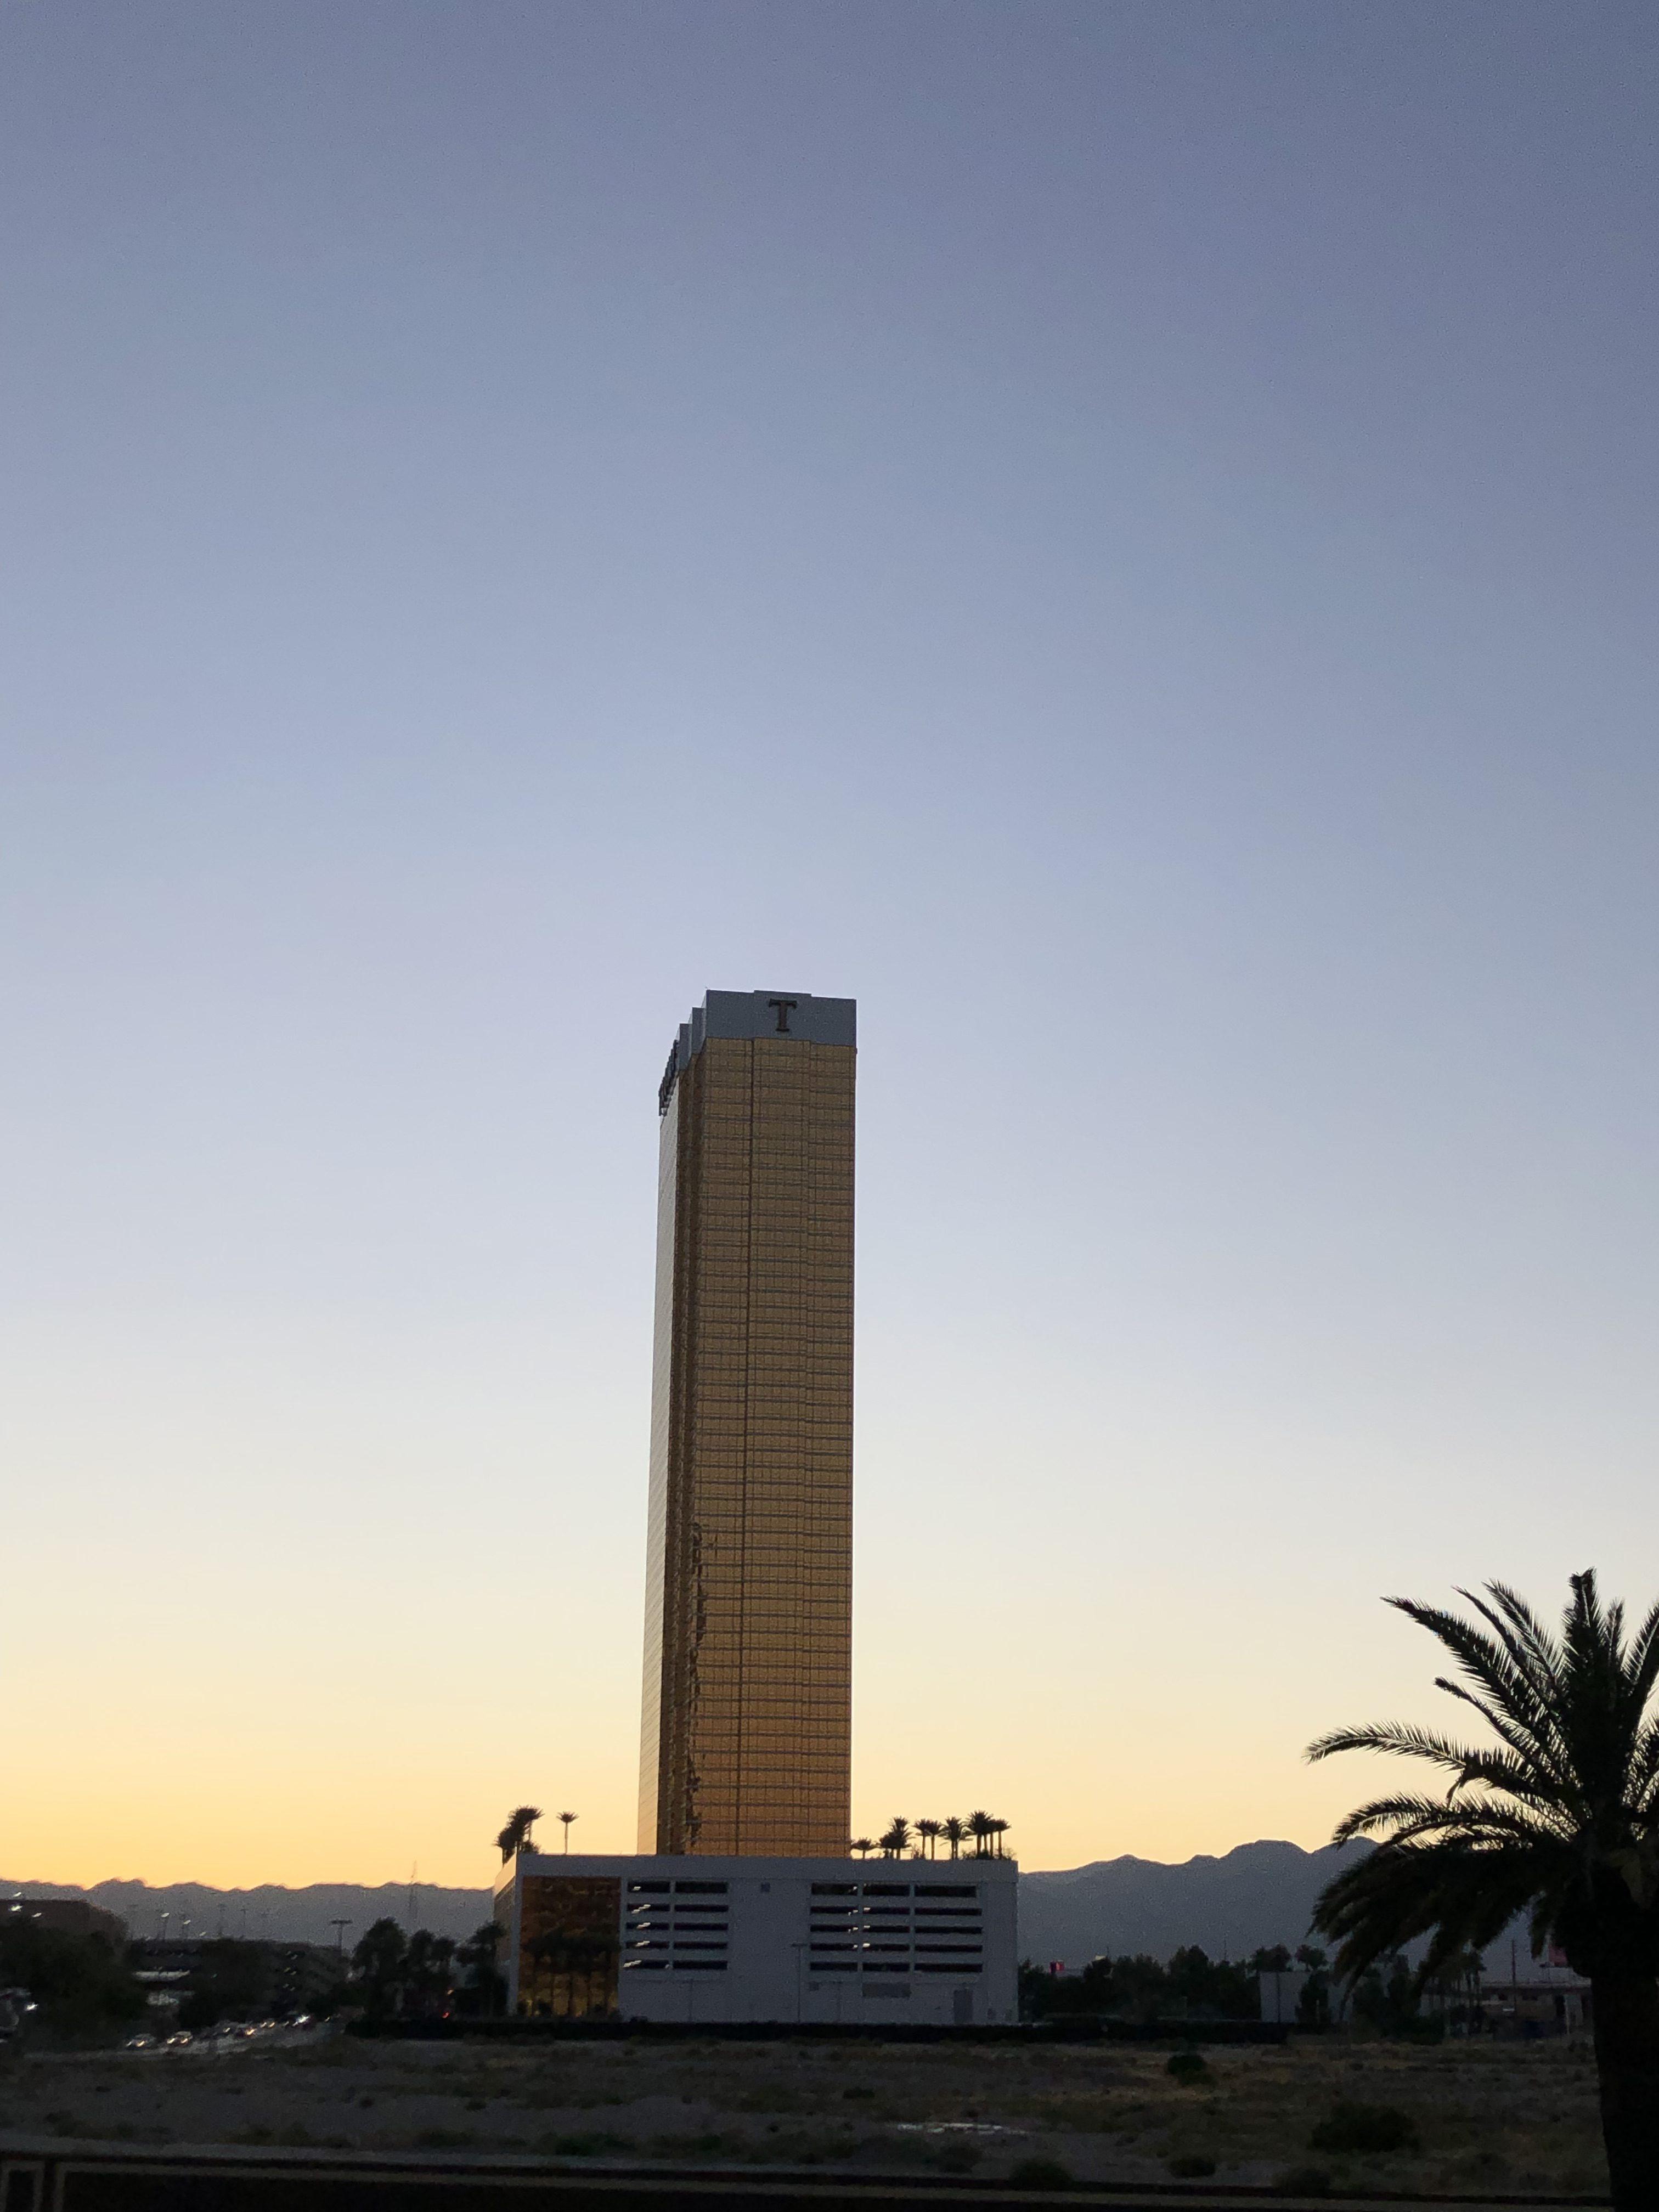 Wilf Sweetland's LIA Diary from Las Vegas #1